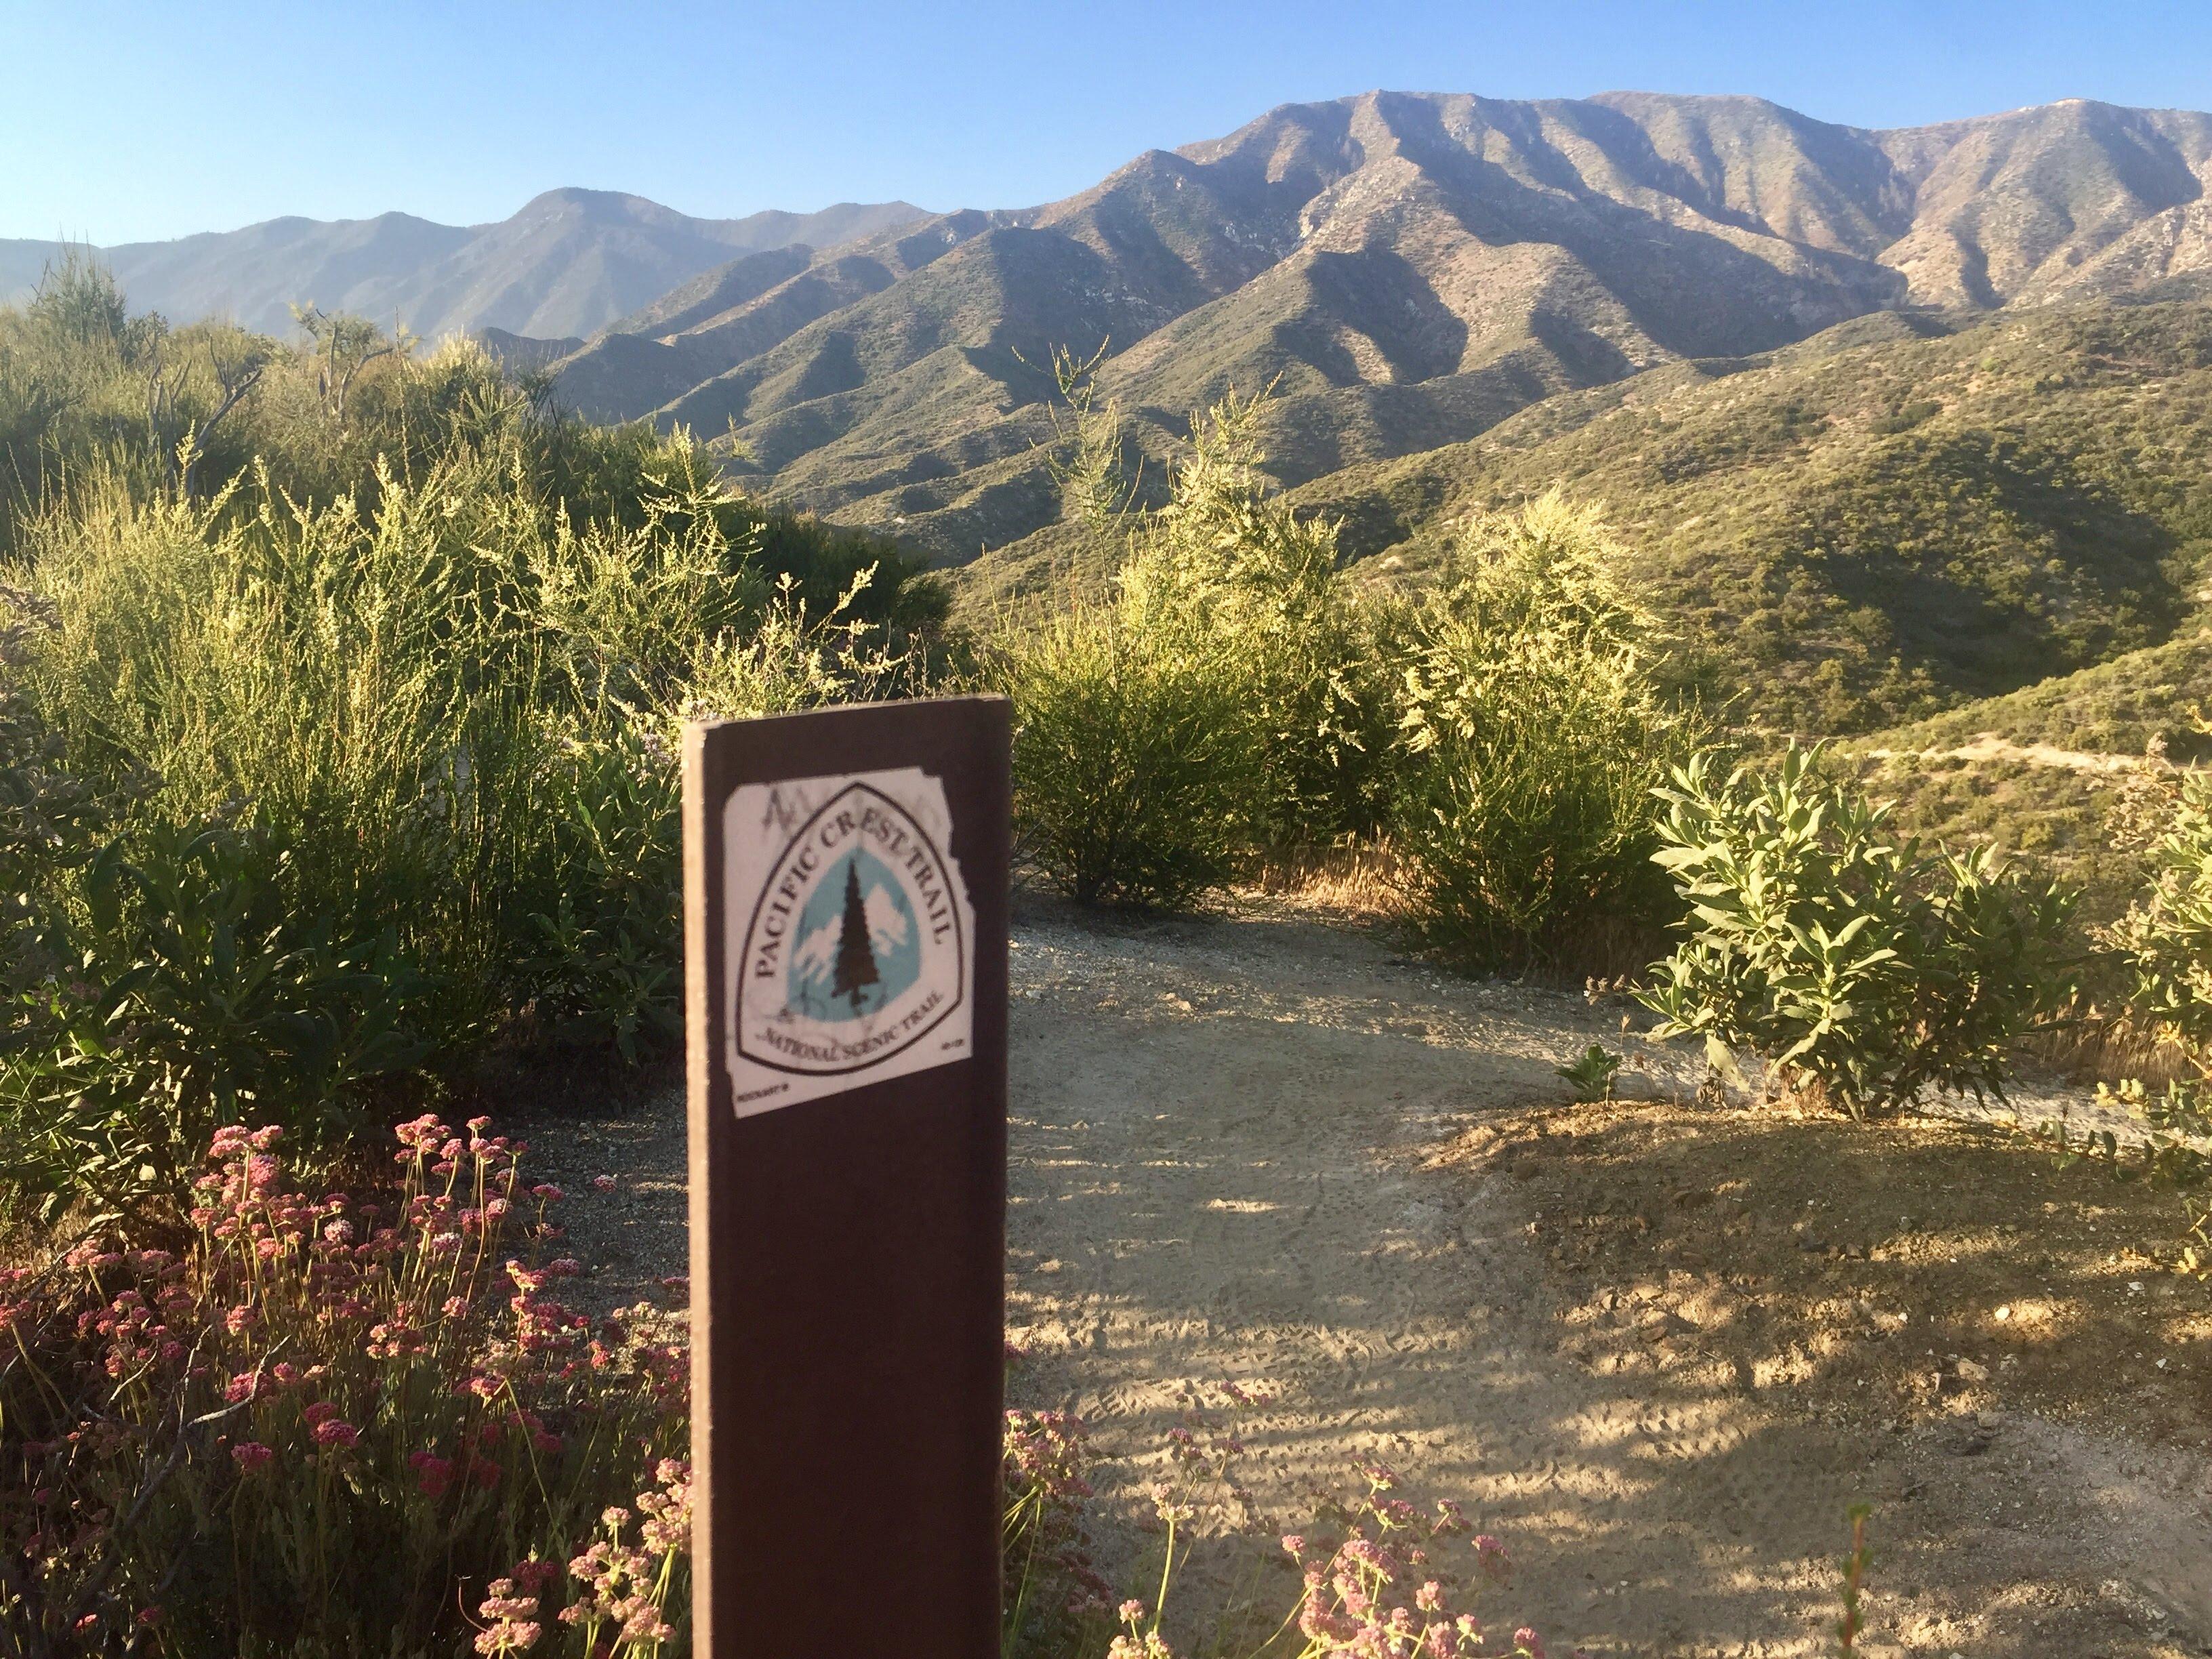 Why Thru-Hiking Sometimes Sucks - The Trek